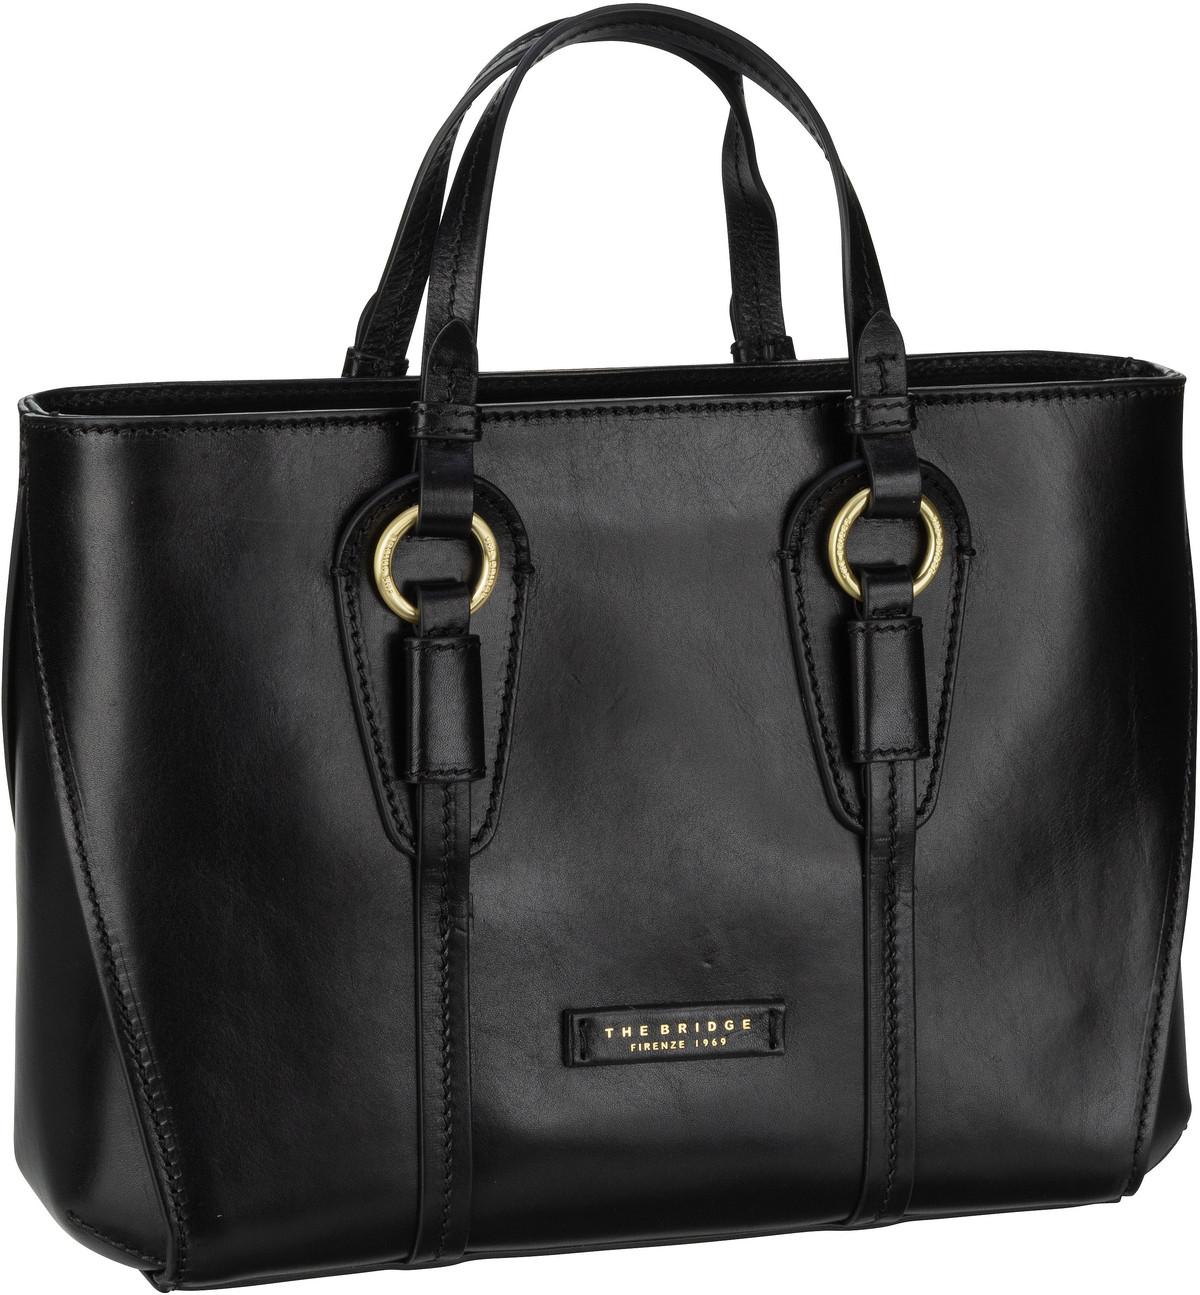 Handtasche Strozzi 3830 Nero/Oro